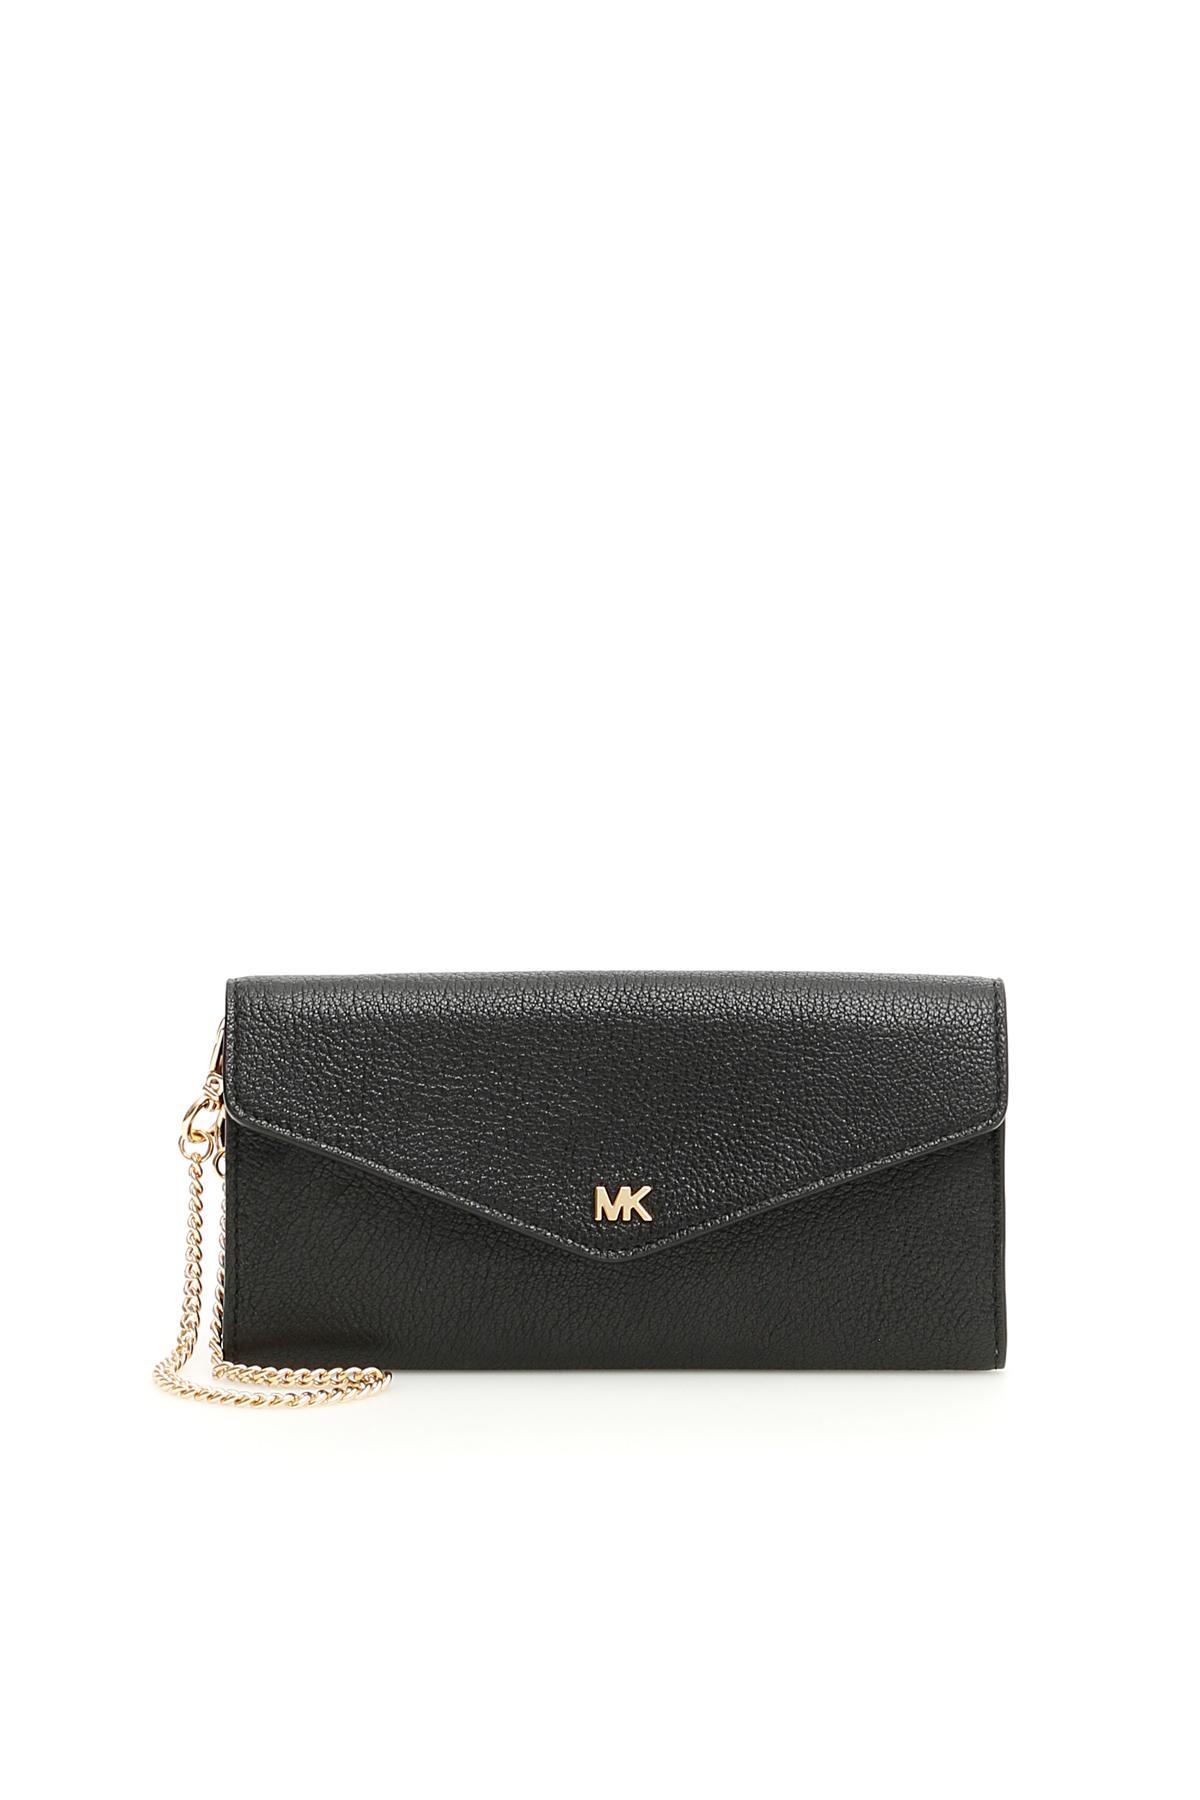 6a1d2765d5bf Michael Kors Women Fashion price in Malaysia - Best Michael Kors Women  Fashion